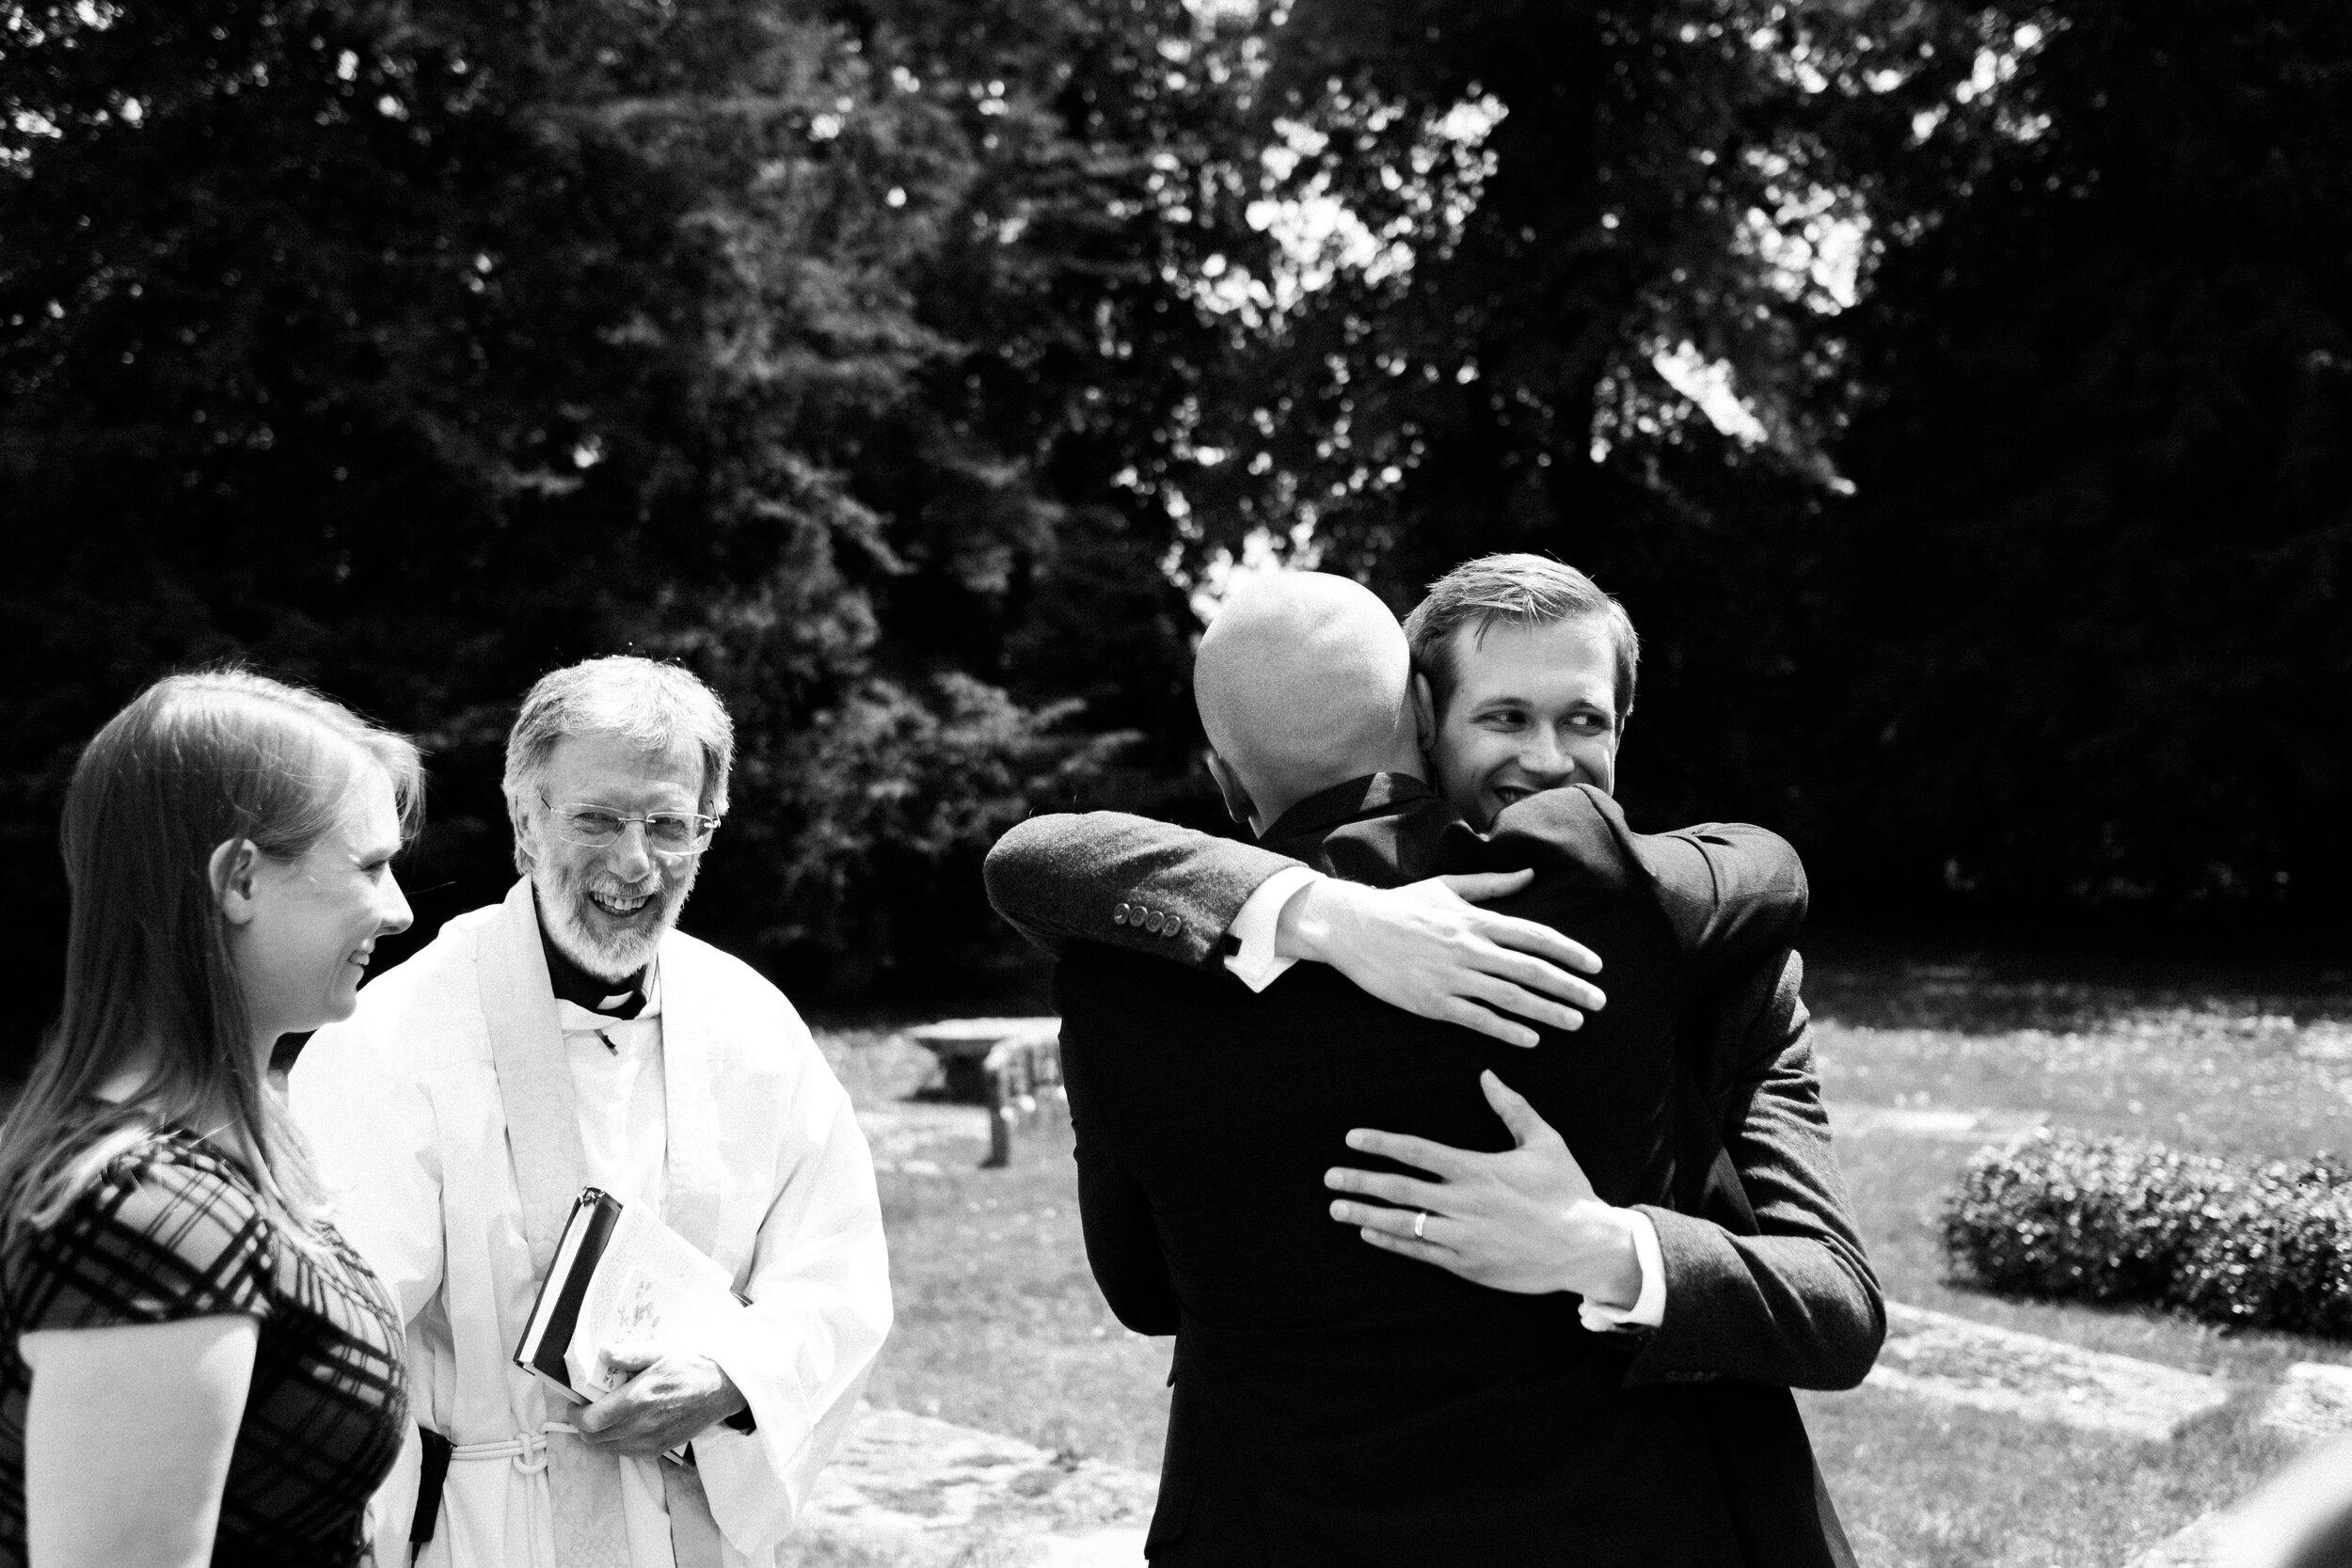 scott-stockwell-photography-wedding-photographer-josh-freya-hug.jpg